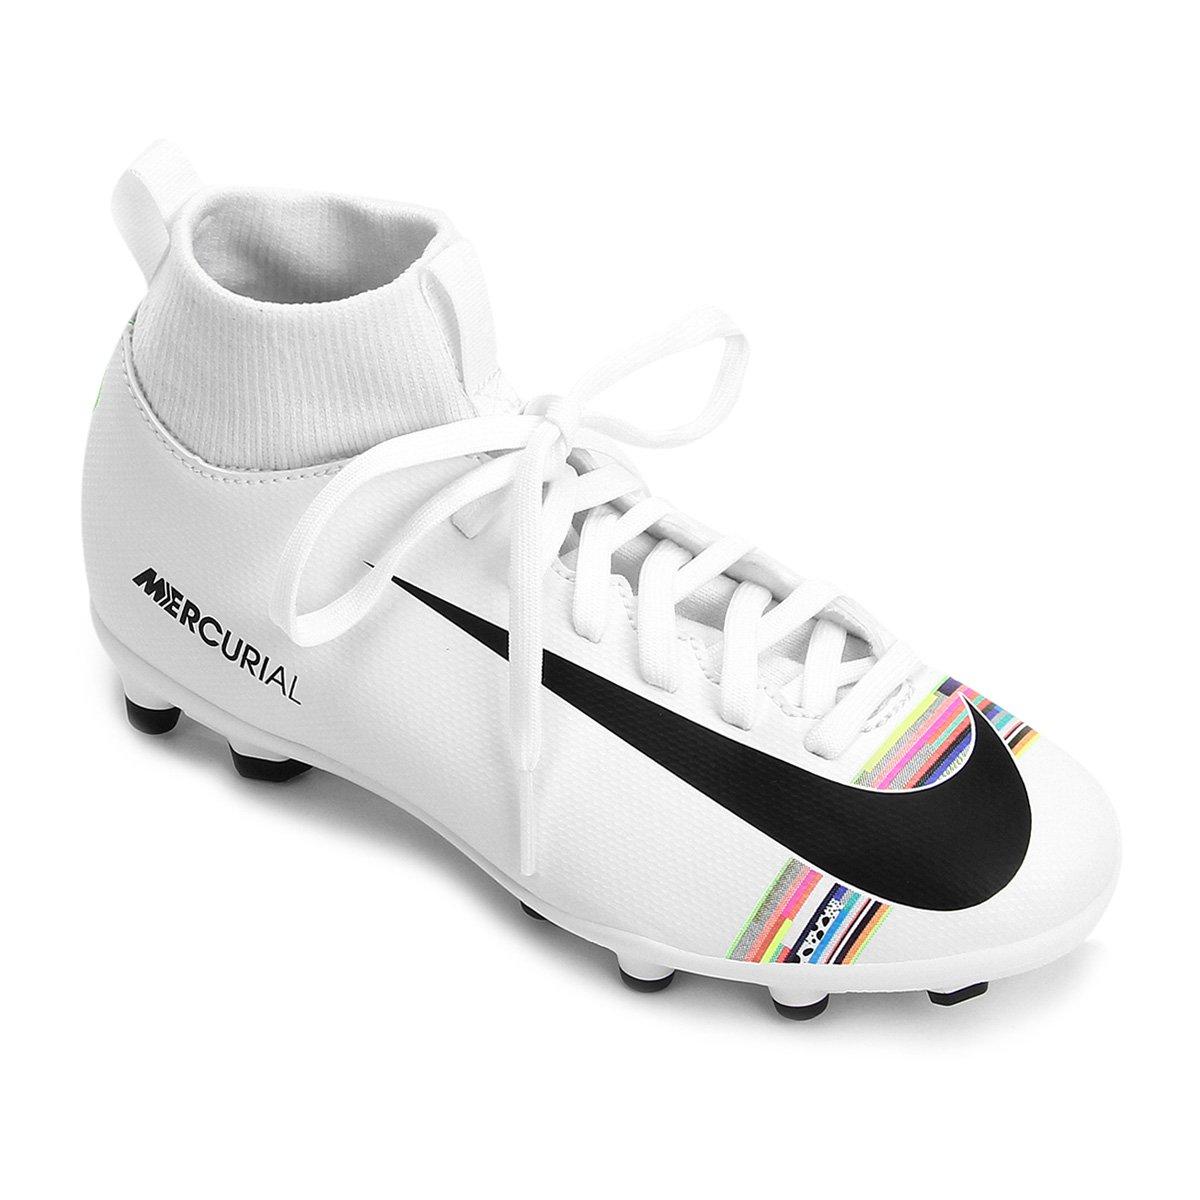 55ead153dc68b Chuteira Campo Infantil Nike Mercurial Superfly 6 Club CR7 FG - Branco e  Preto | Loja do Inter